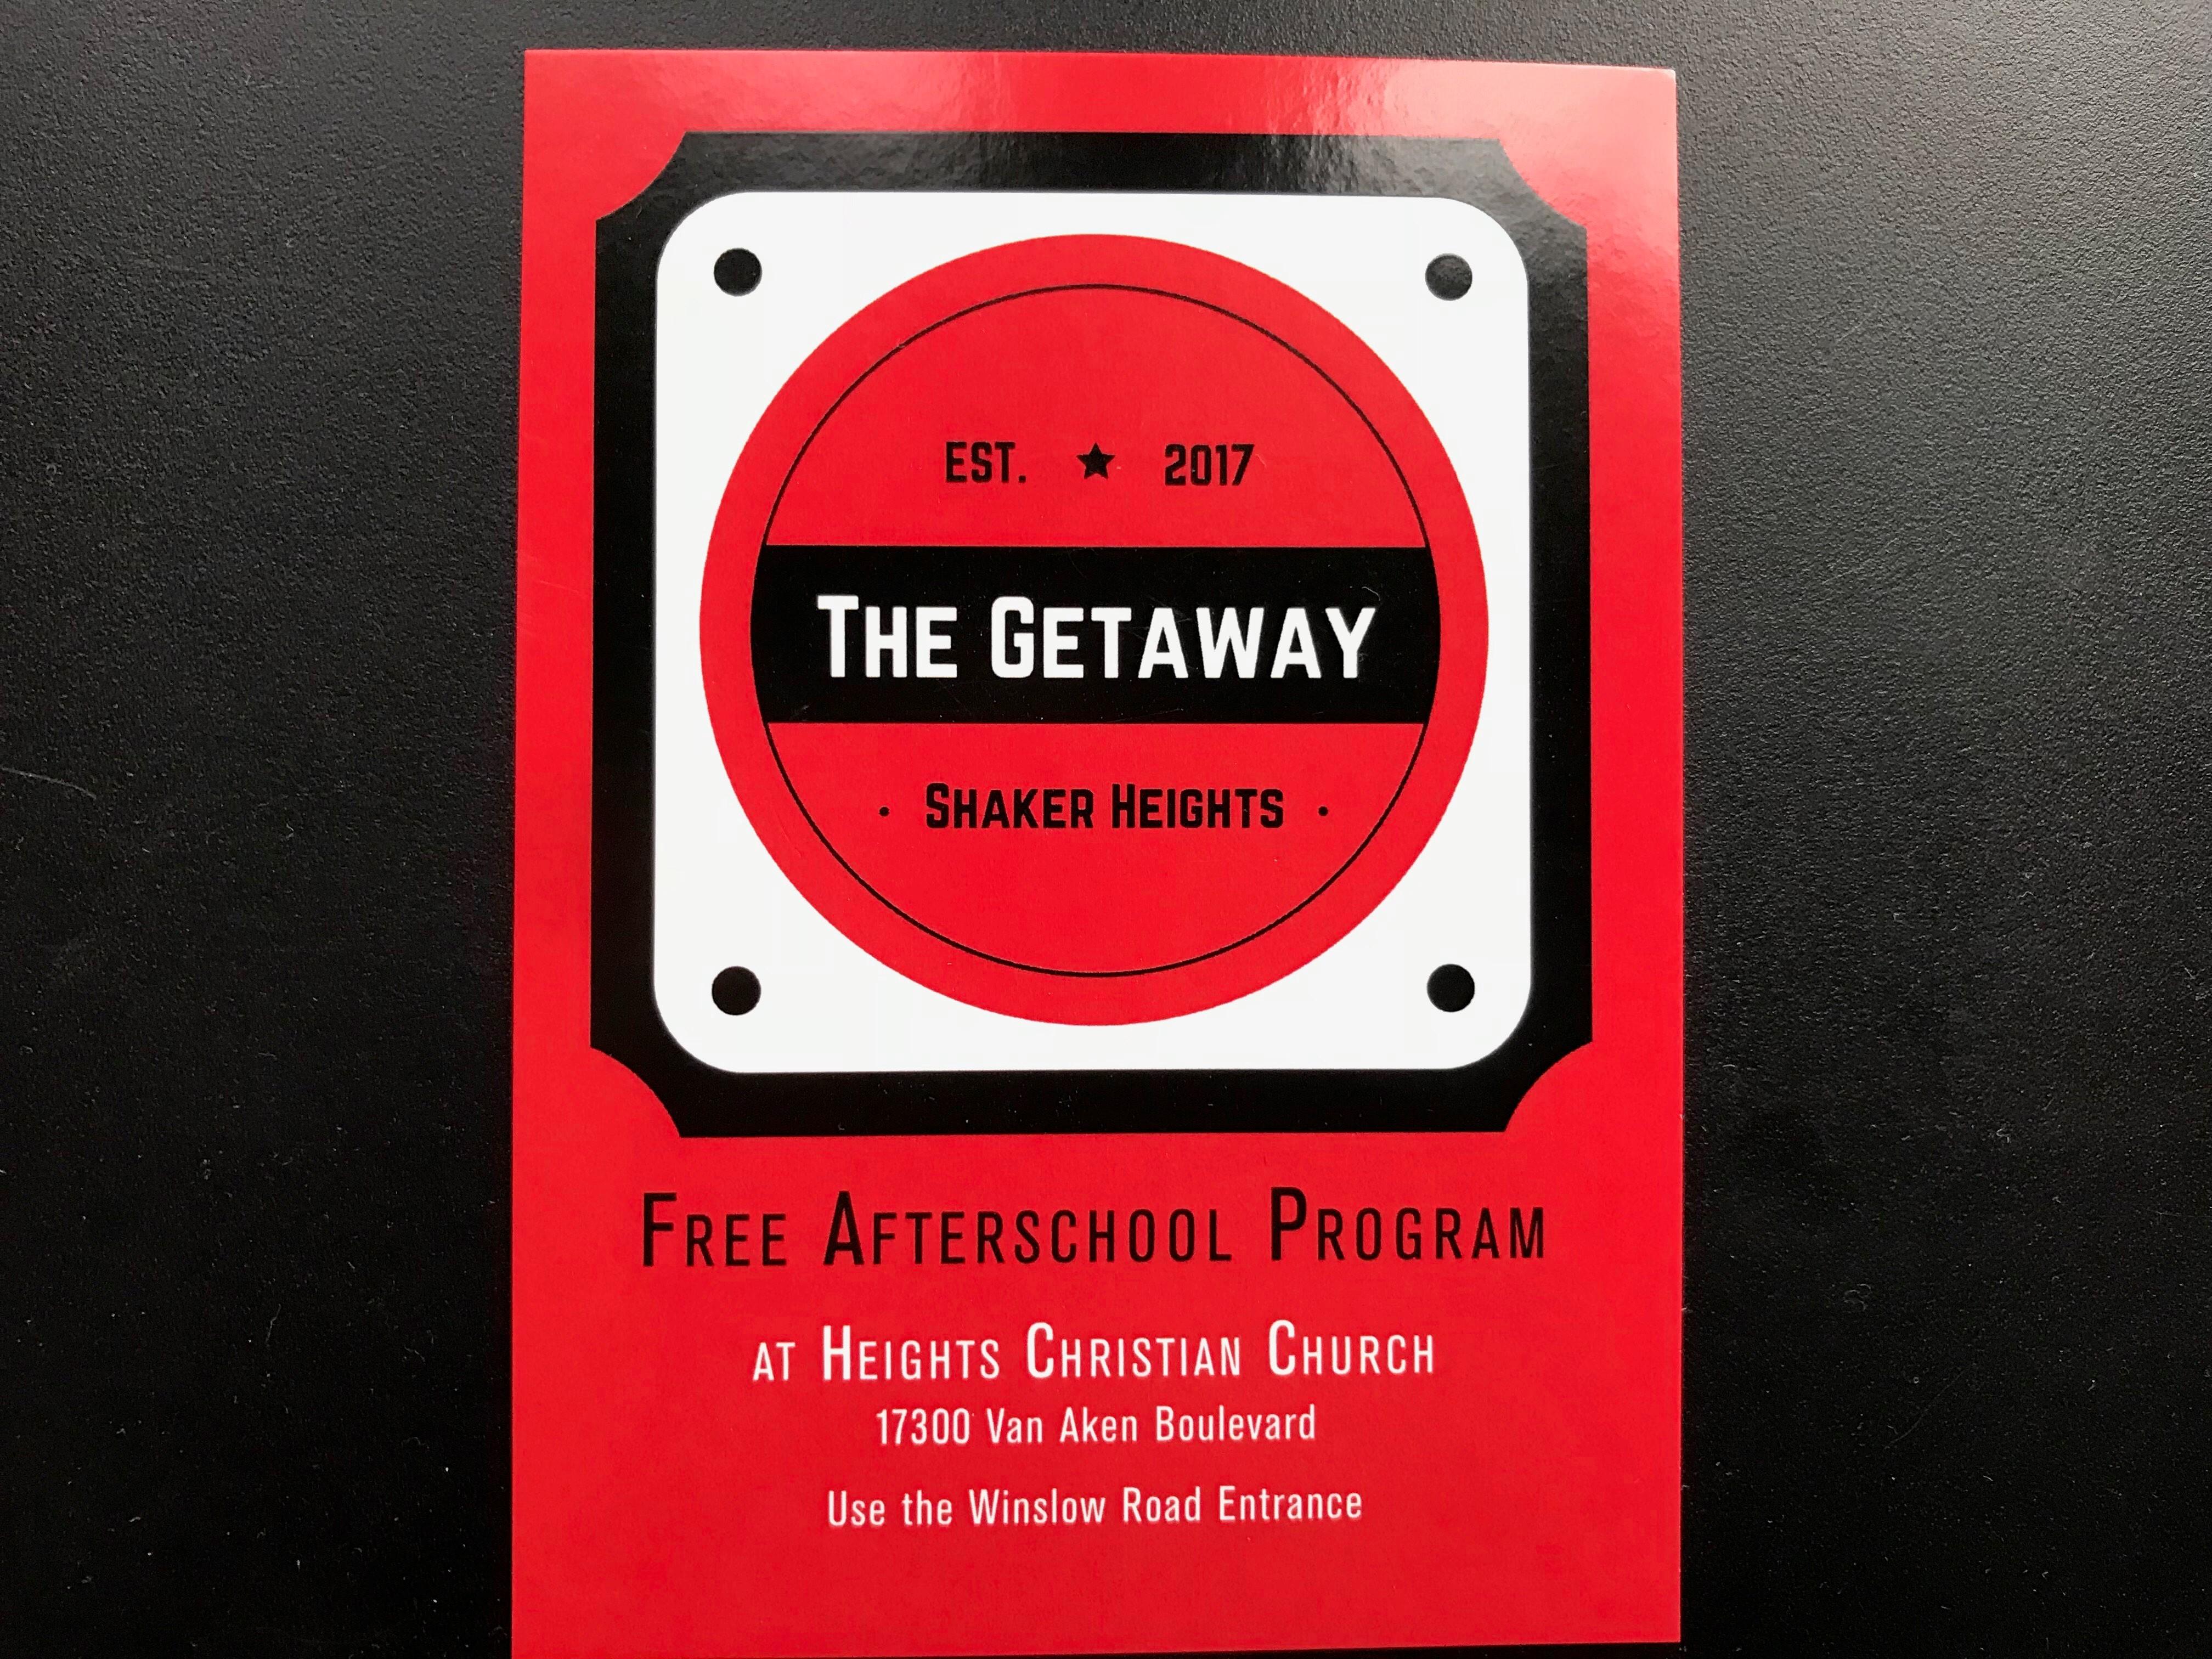 171009_TheGetaway.jpeg